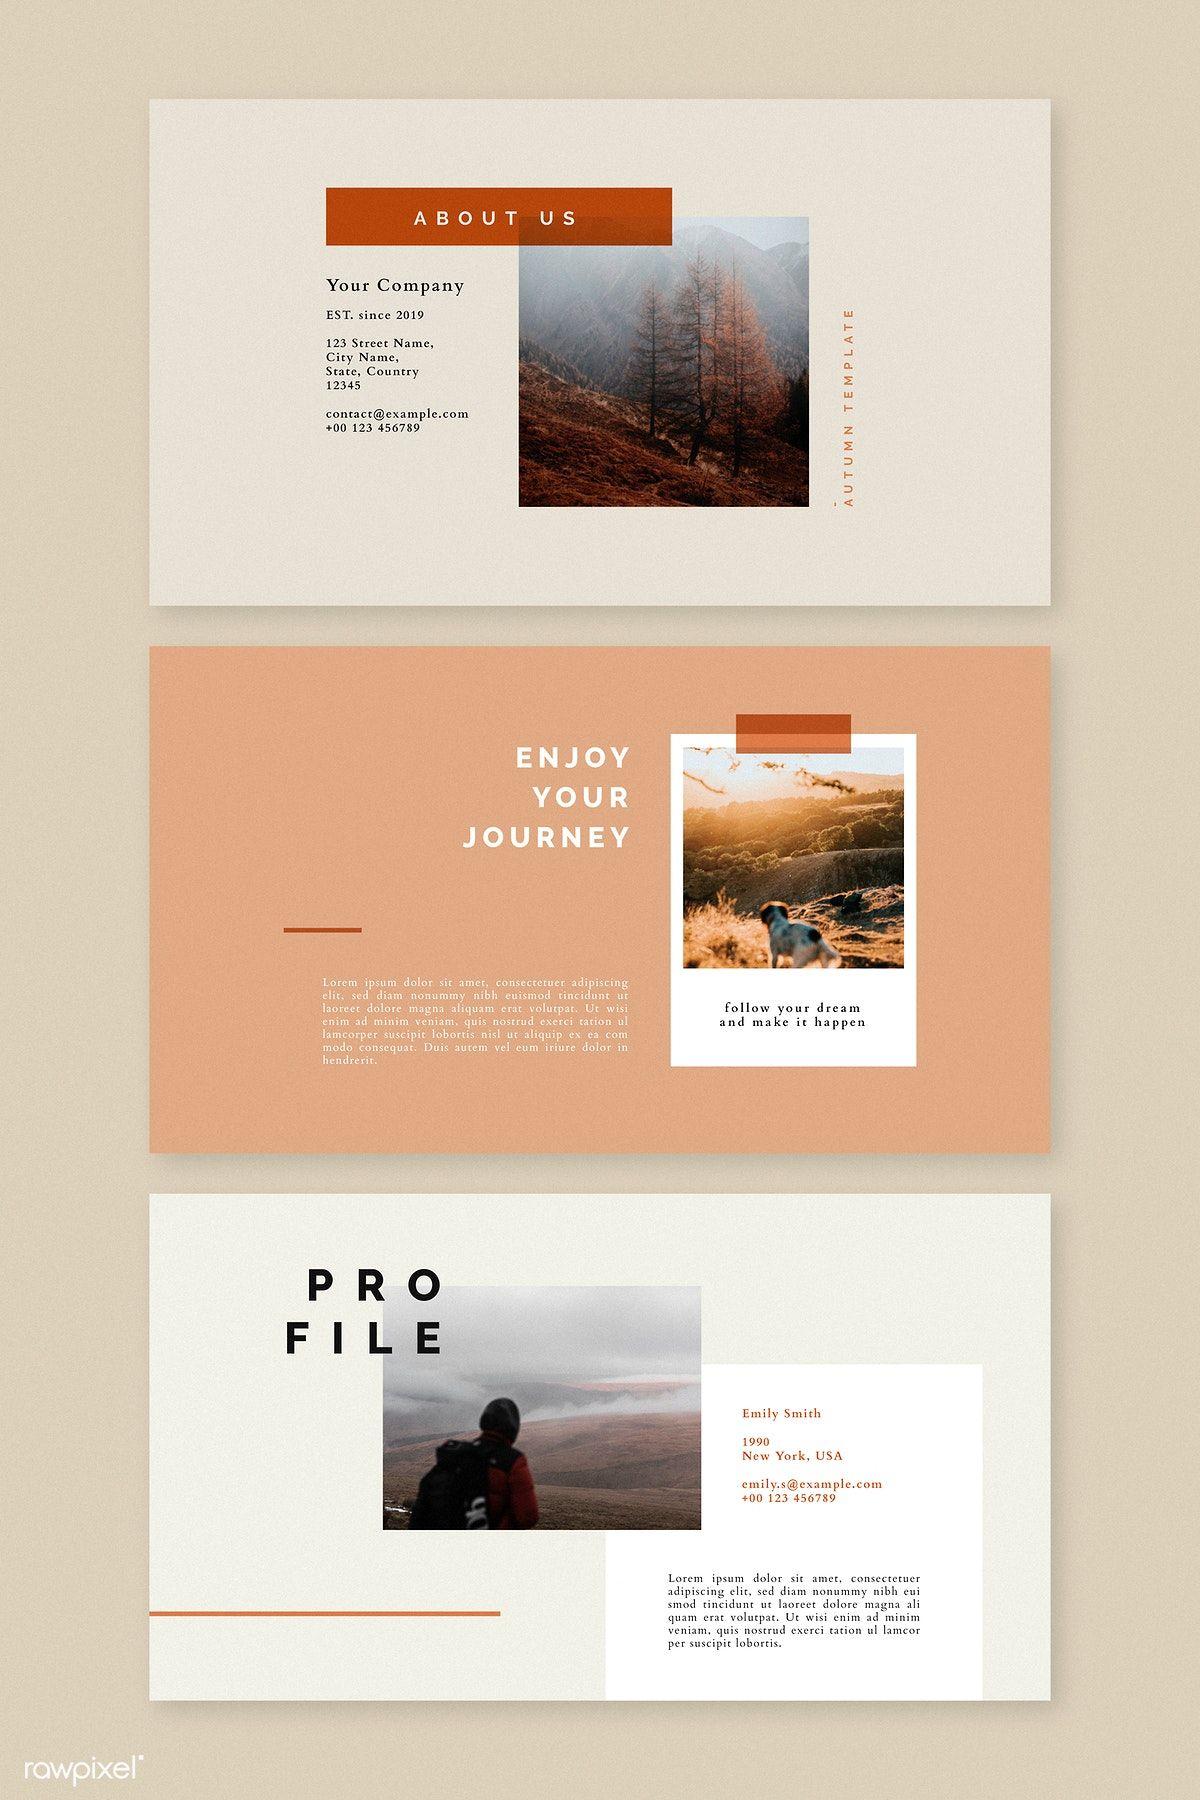 Download Premium Vector Of Autumn Color Tone Social Media Blog Template Presentation Layout Powerpoint Presentation Design Presentation Design Layout